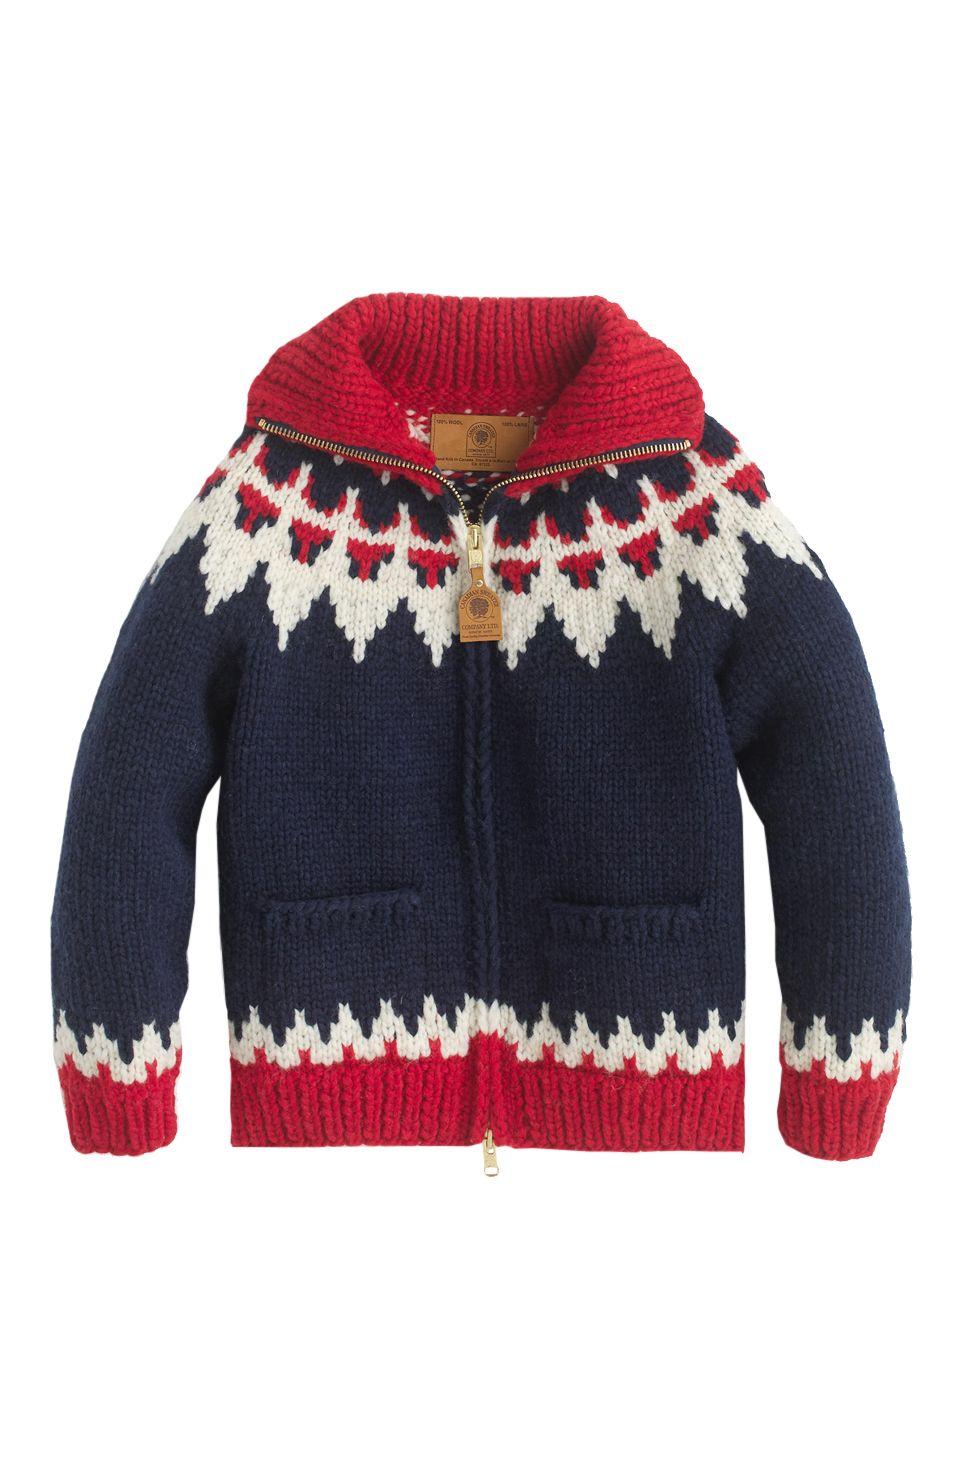 "<p>Canadian Sweater Company™ Cardigan Sweater, $400; <a href=""https://www.jcrew.com/womens_category/sweaters/cardigans/PRDOVR~E5172/E5172.jsp"">jcrew.com</a> </p>"